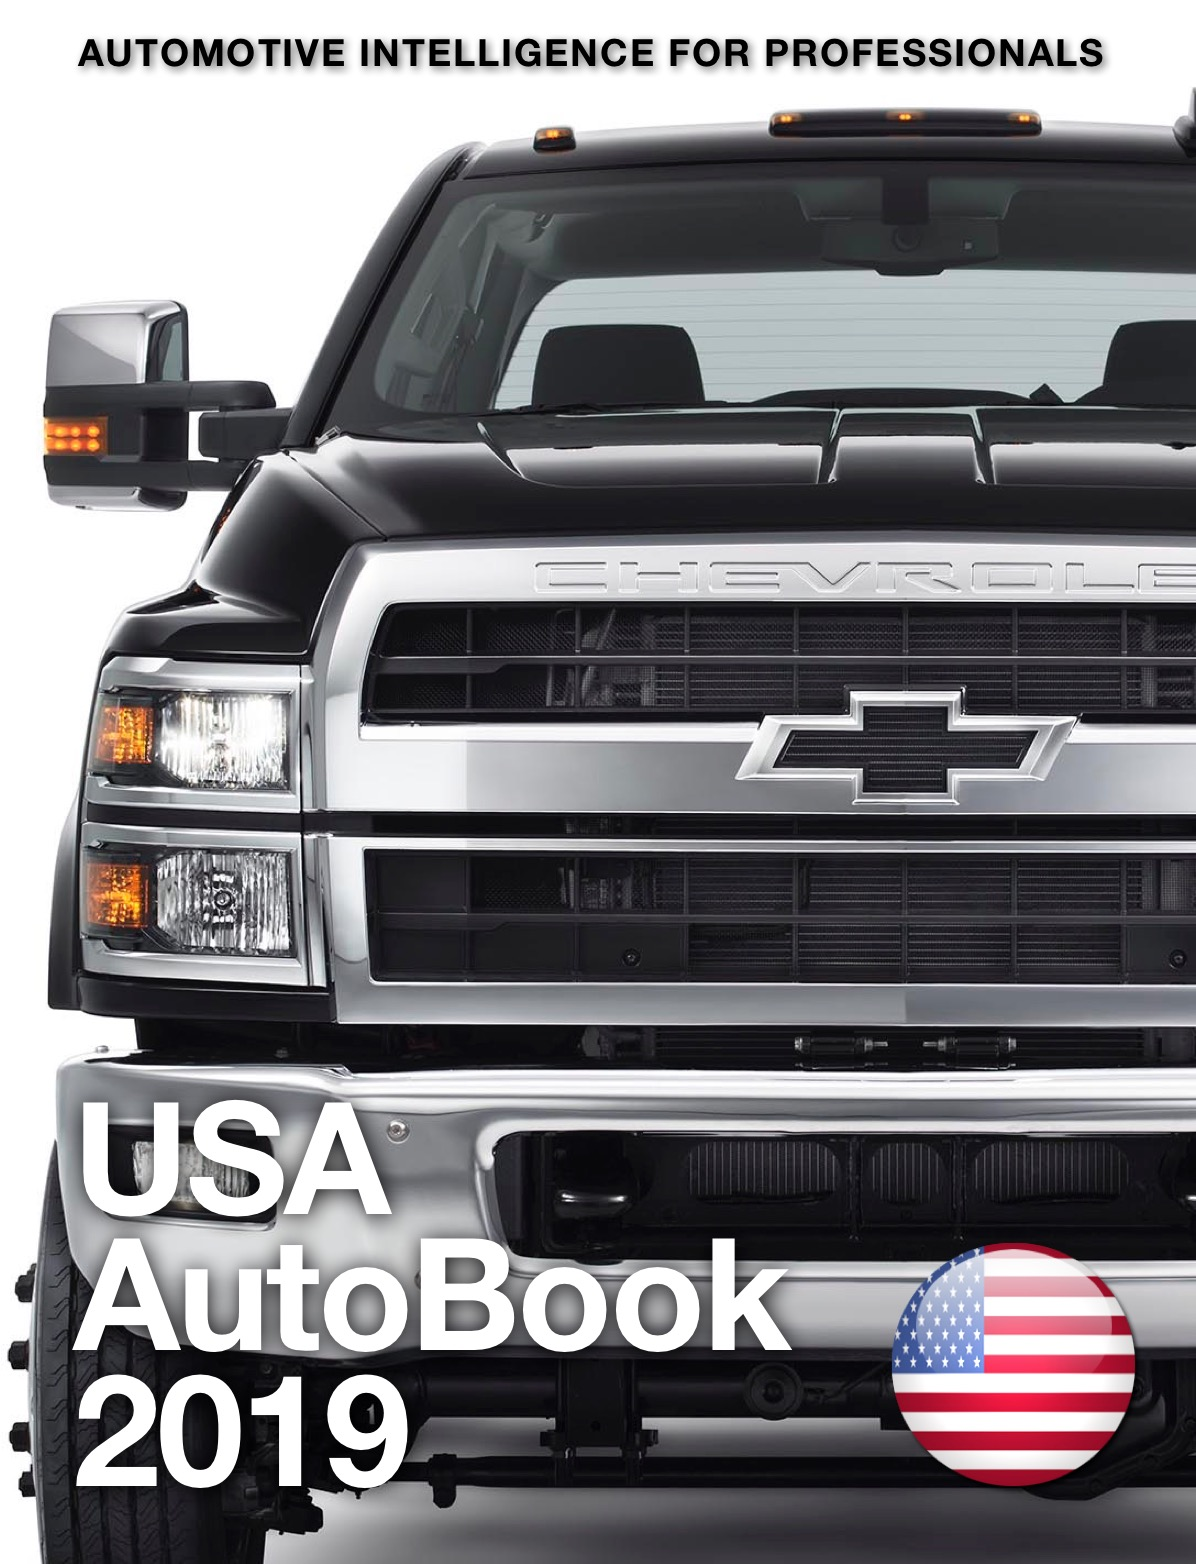 USA AutoBook 2018 1026x1340.jpg